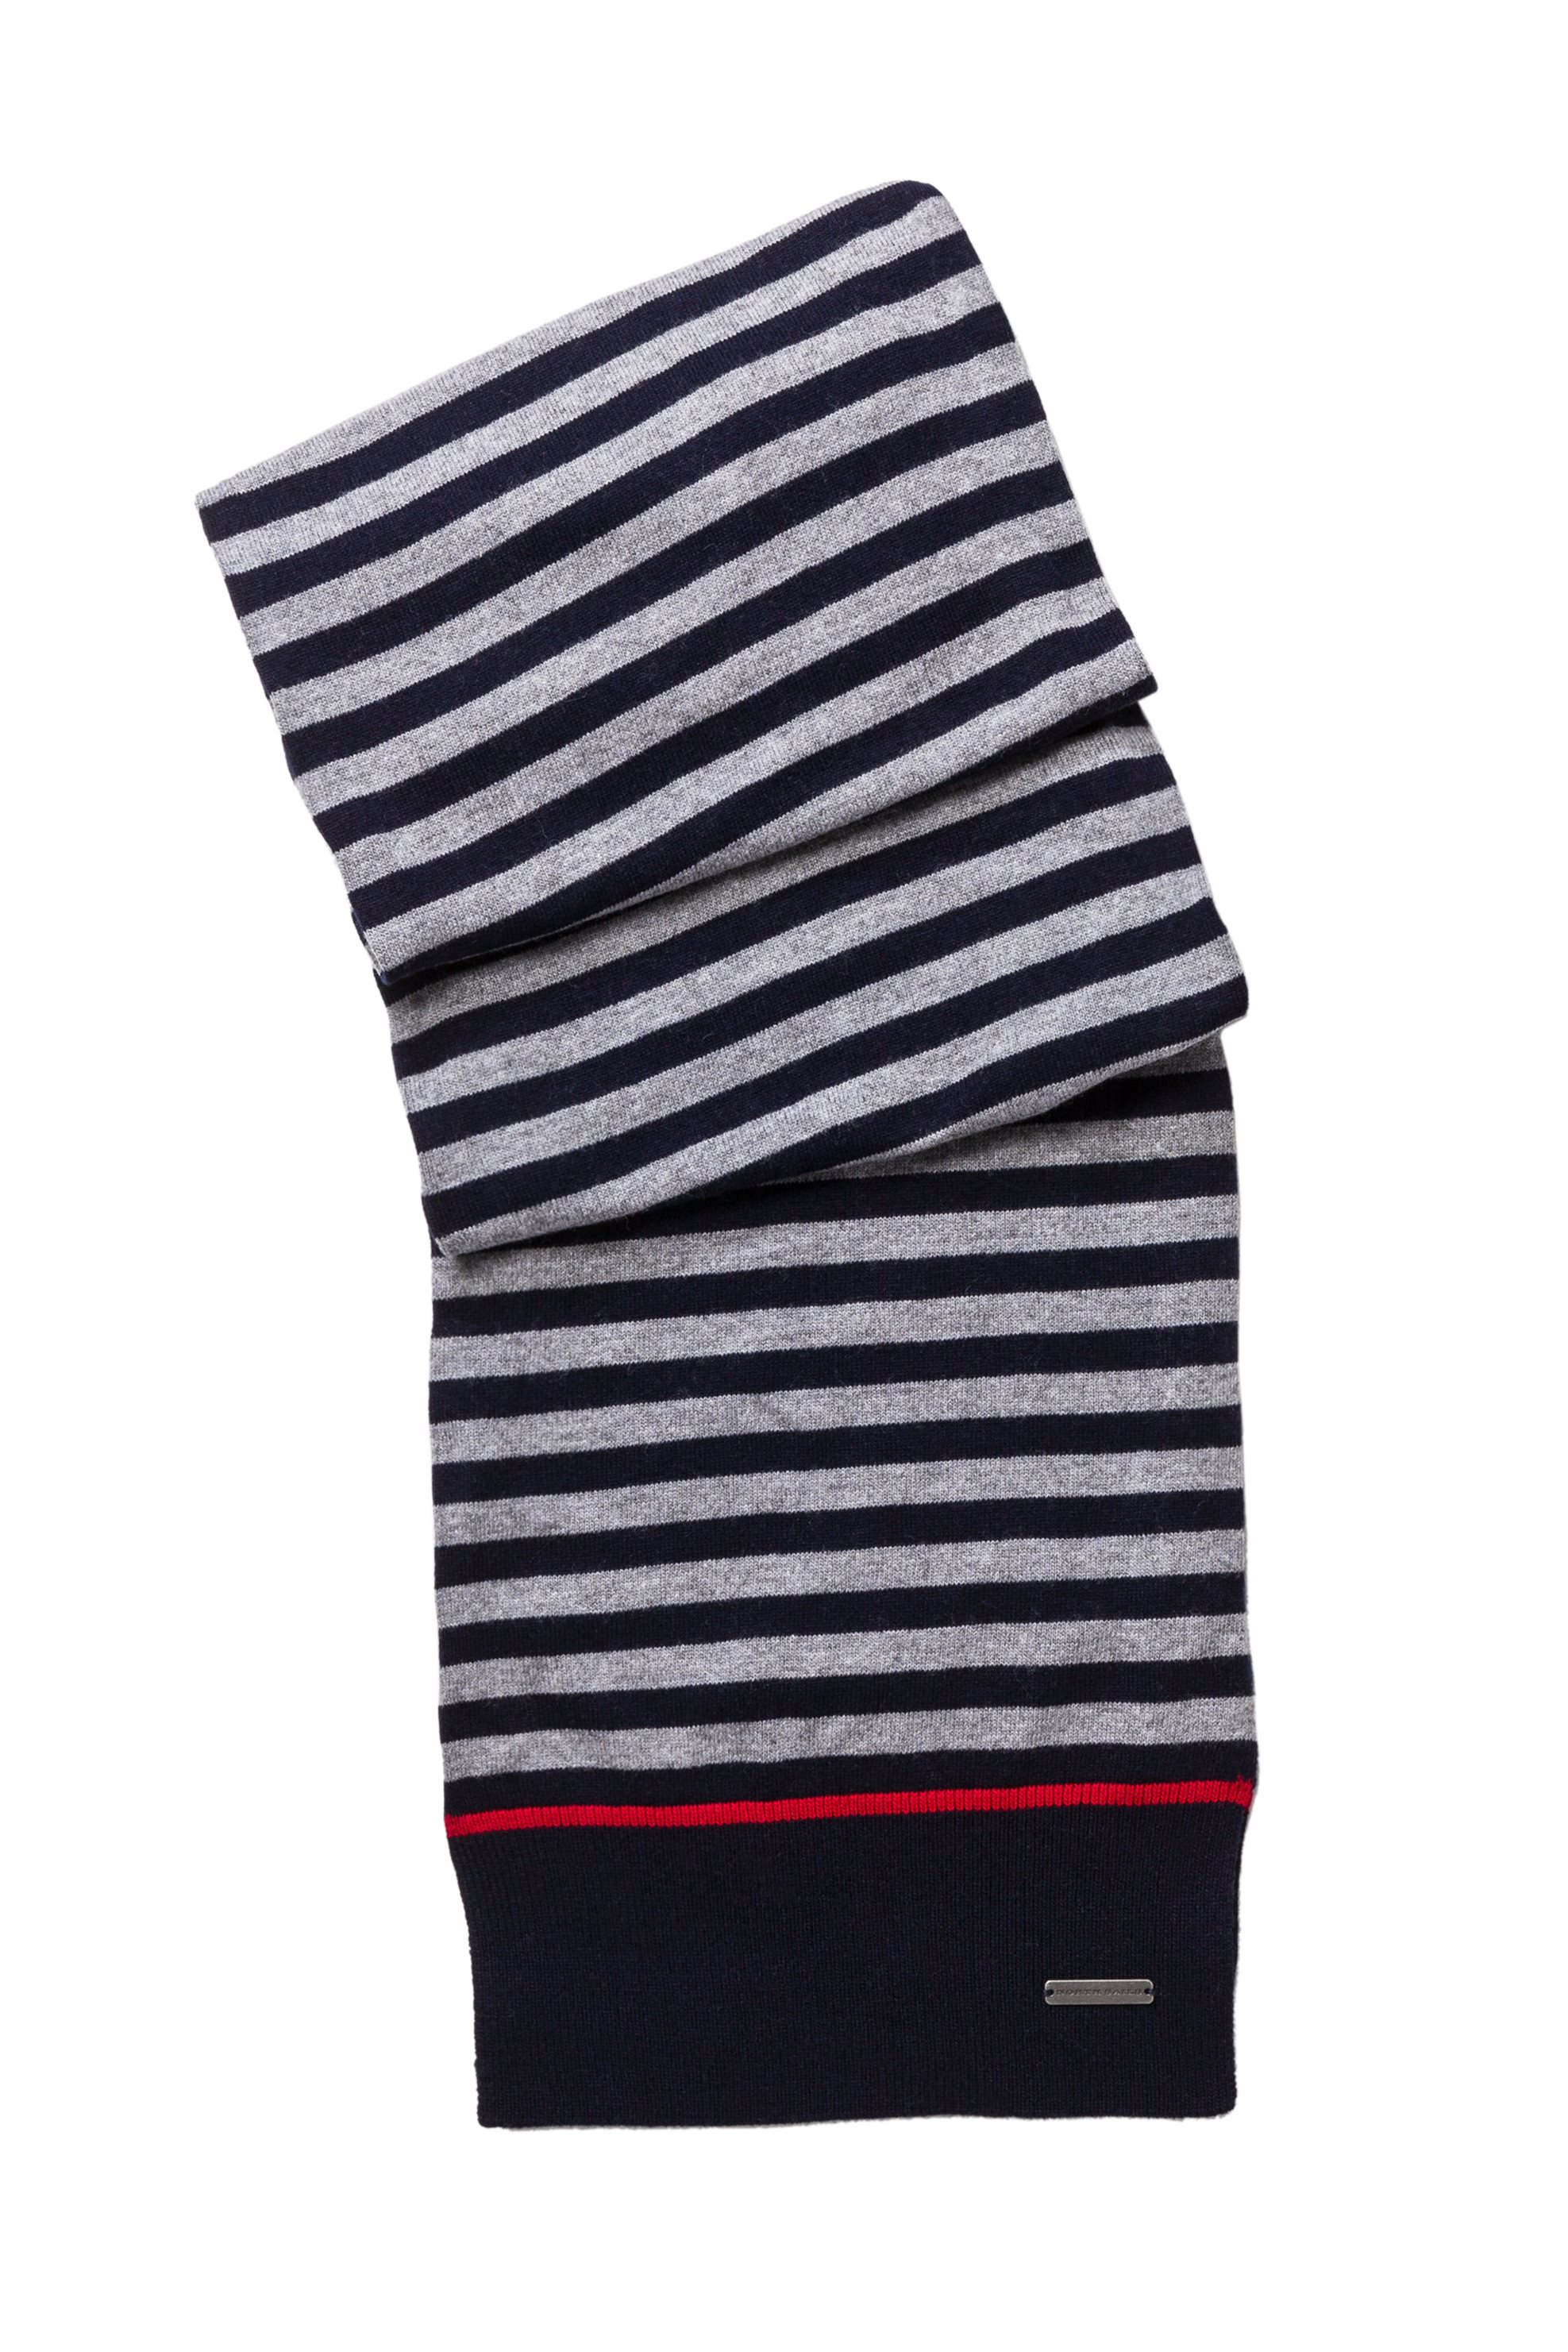 North Sails ανδρικό κασκόλ Striped scarf - 628641 - Γκρι ανδρασ   αξεσουαρ   κασκόλ   μαντήλια